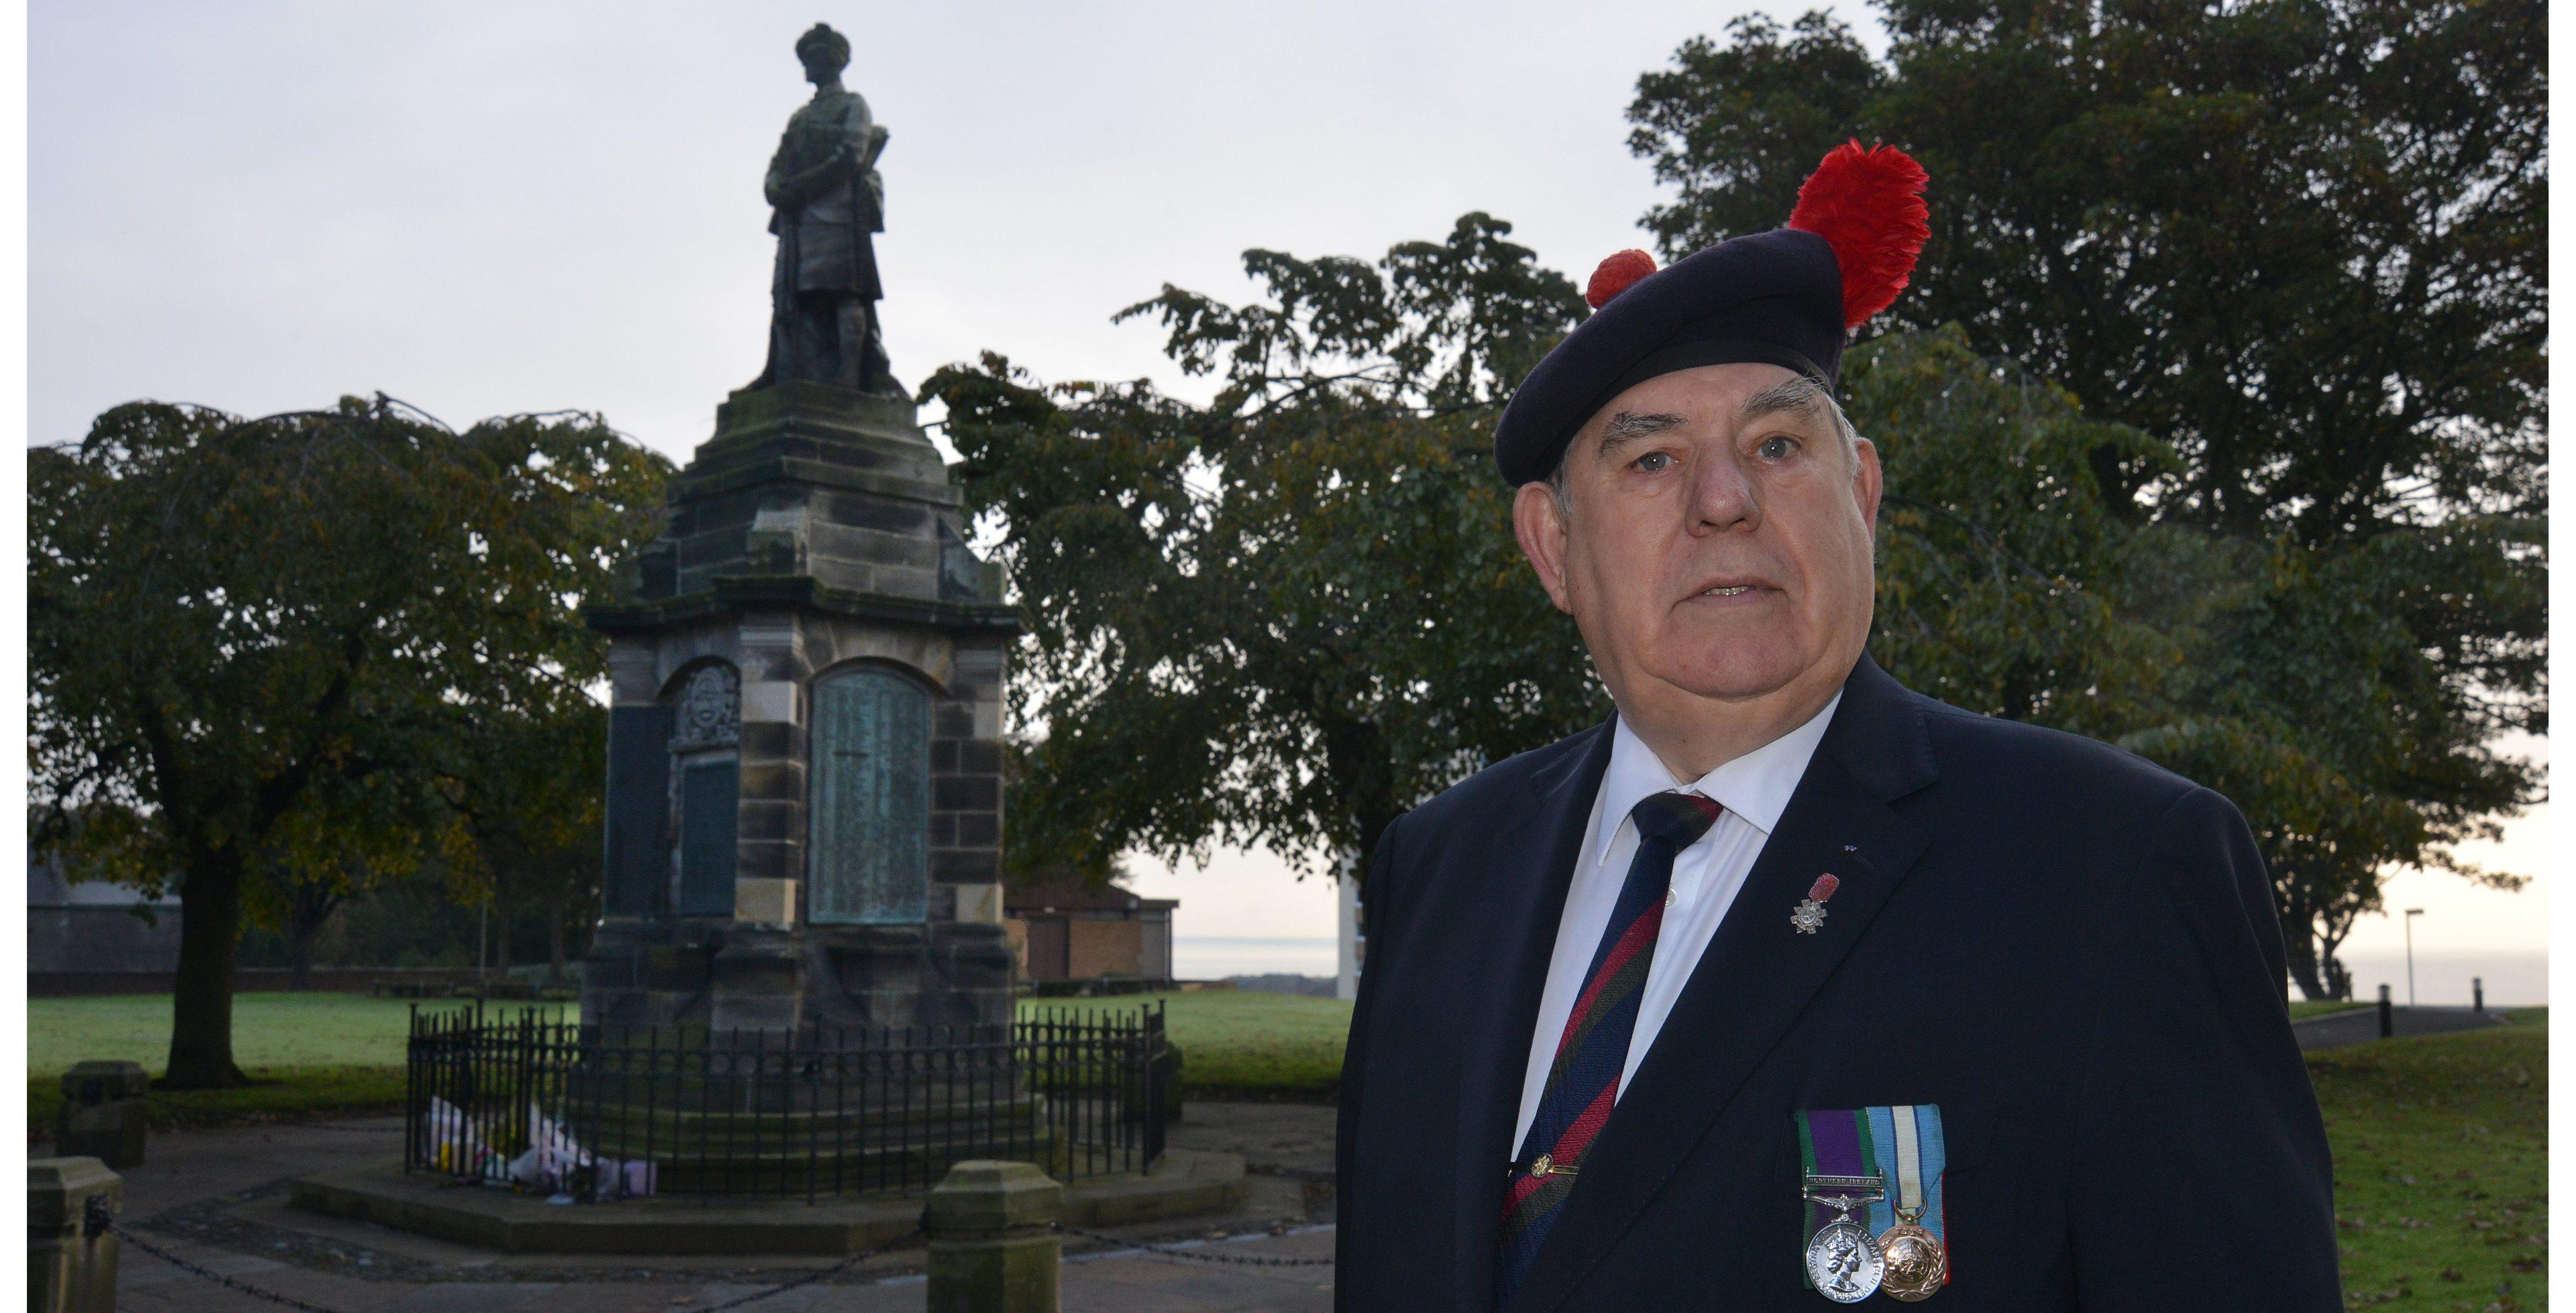 Rob Scott pictured at Methil war memorial